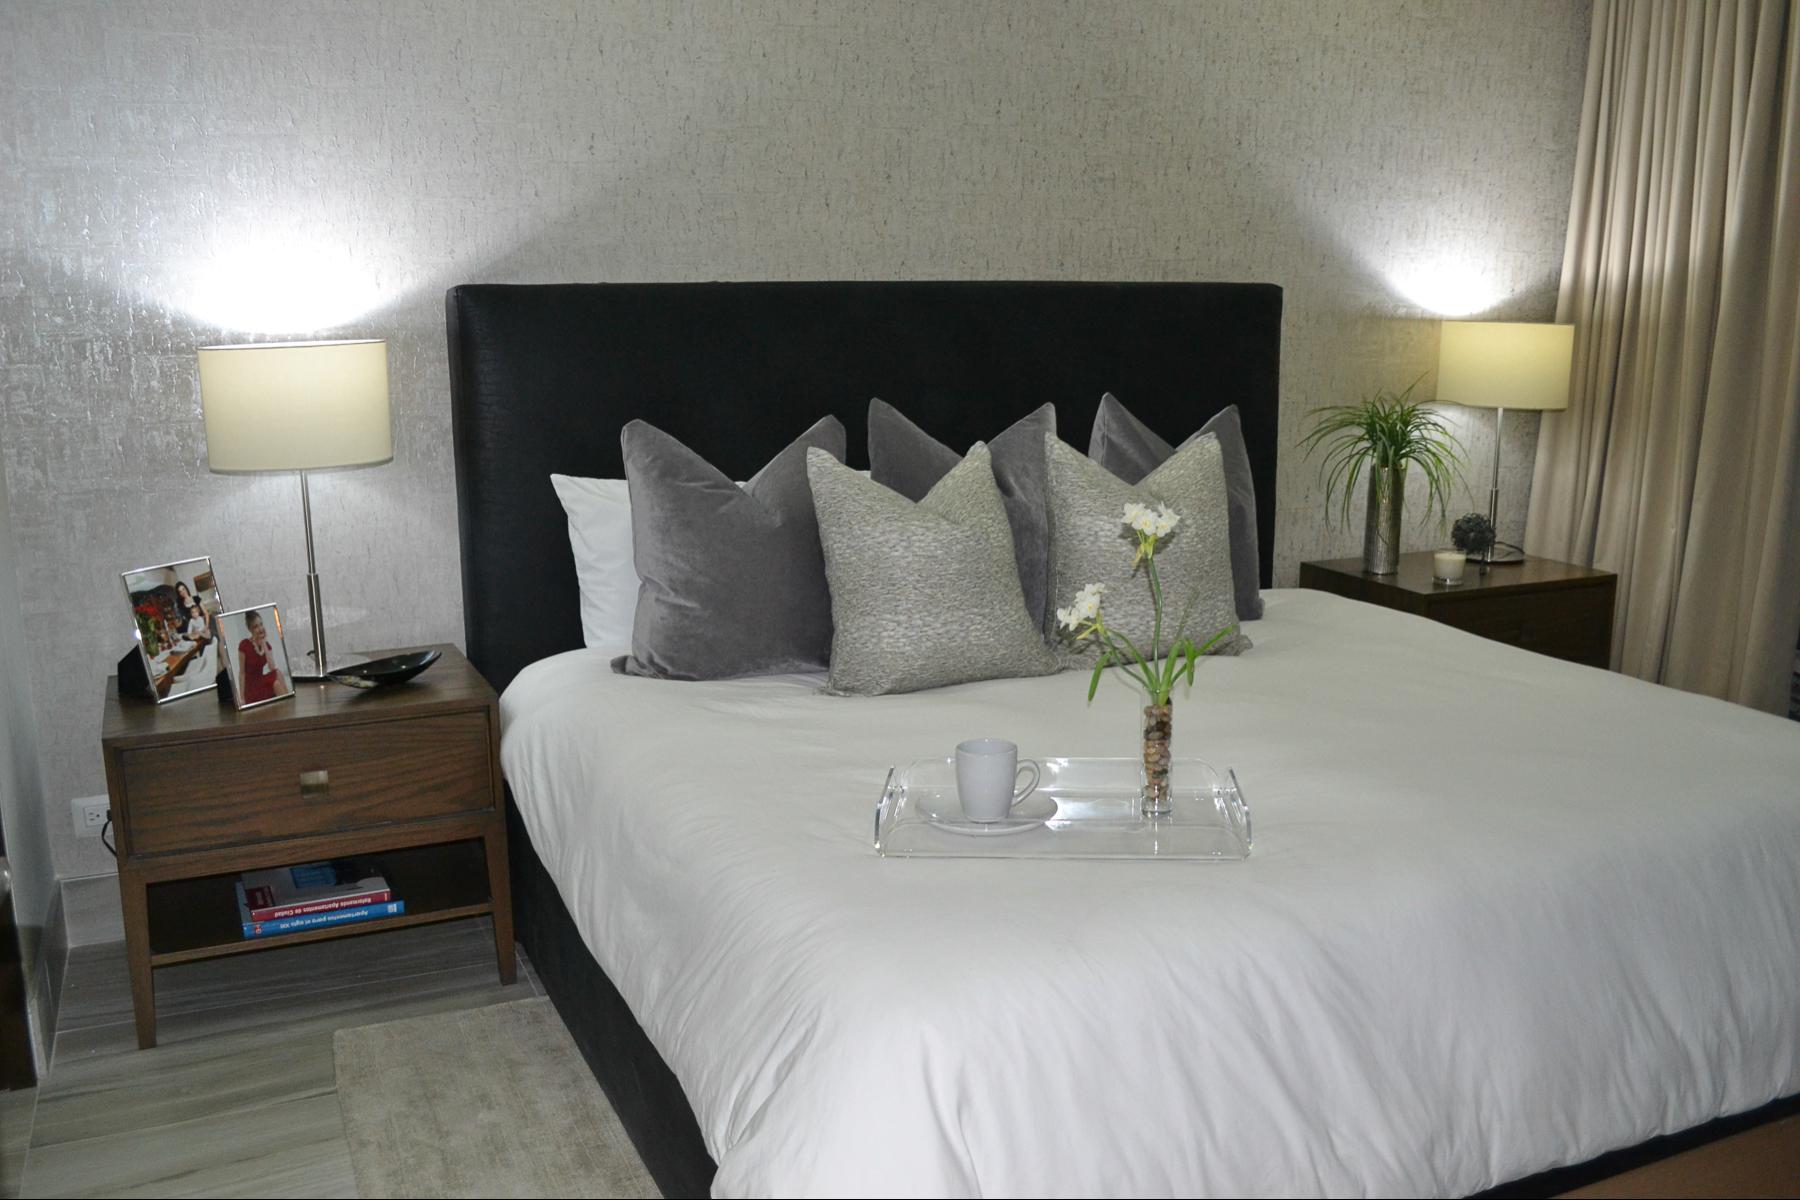 Additional photo for property listing at Kalah San Pedro Garza Garcia, Nuevo Leon Mexico